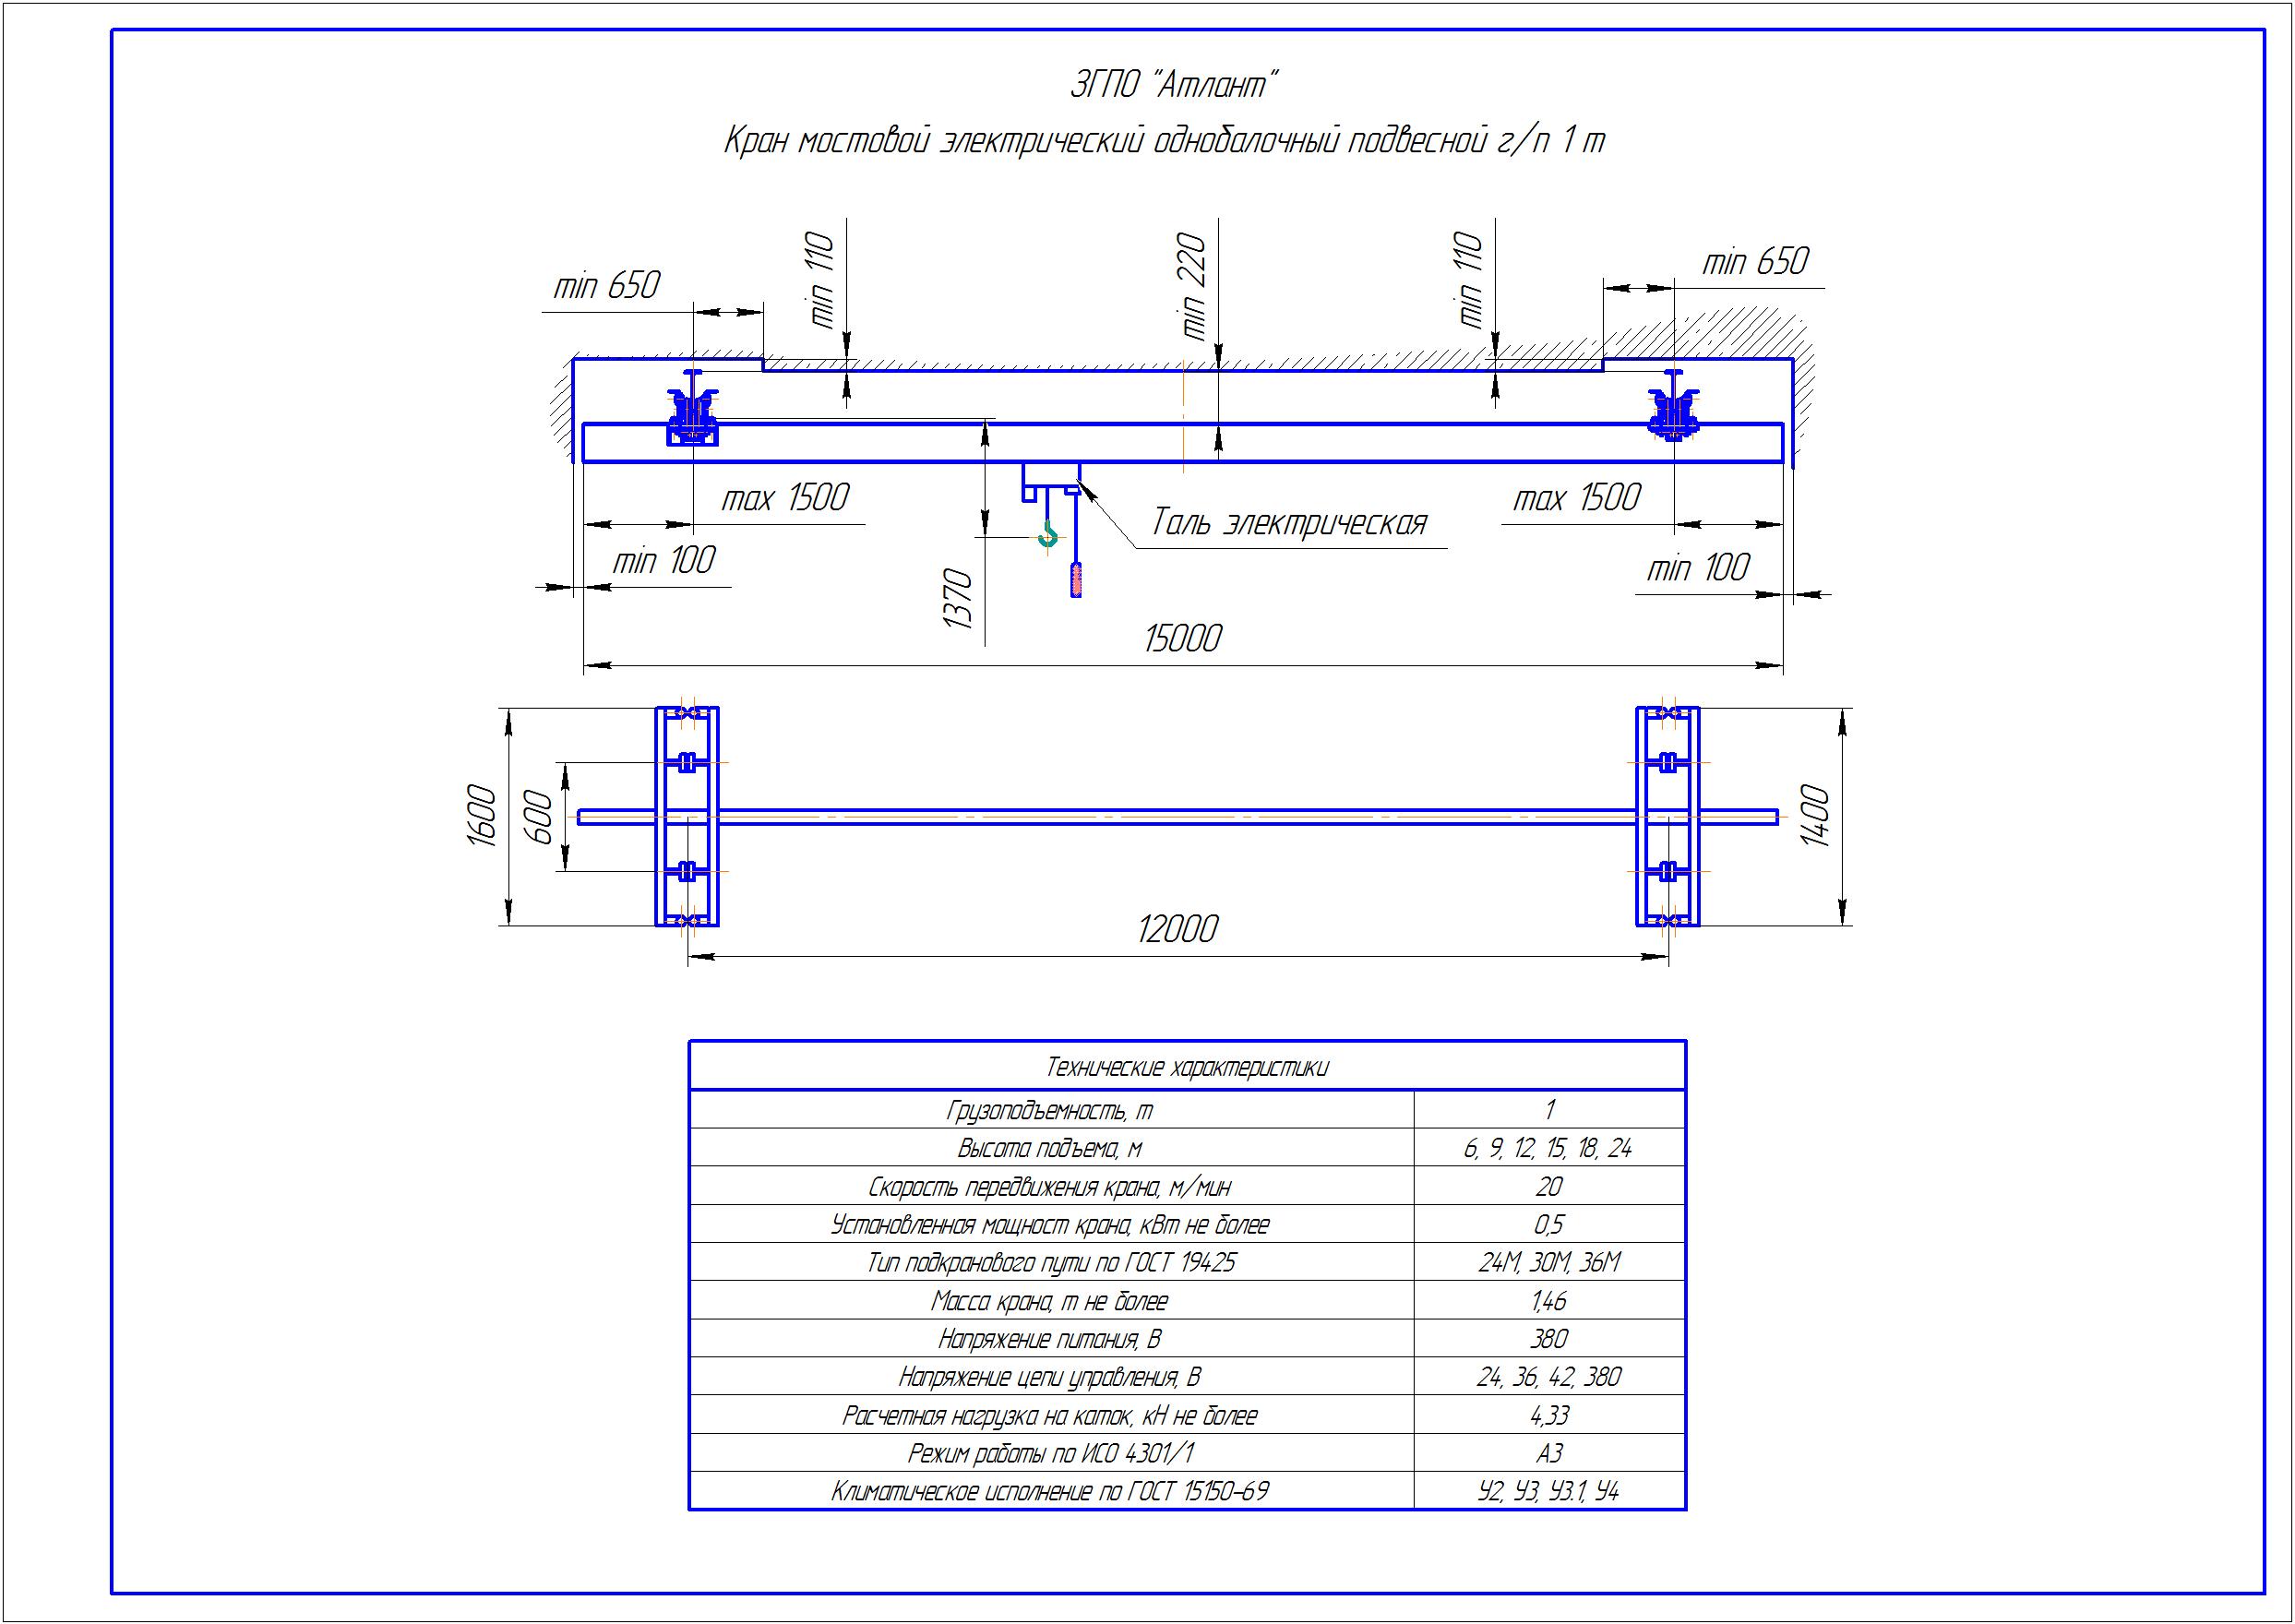 KBP 1 4 - Подвесная кран балка